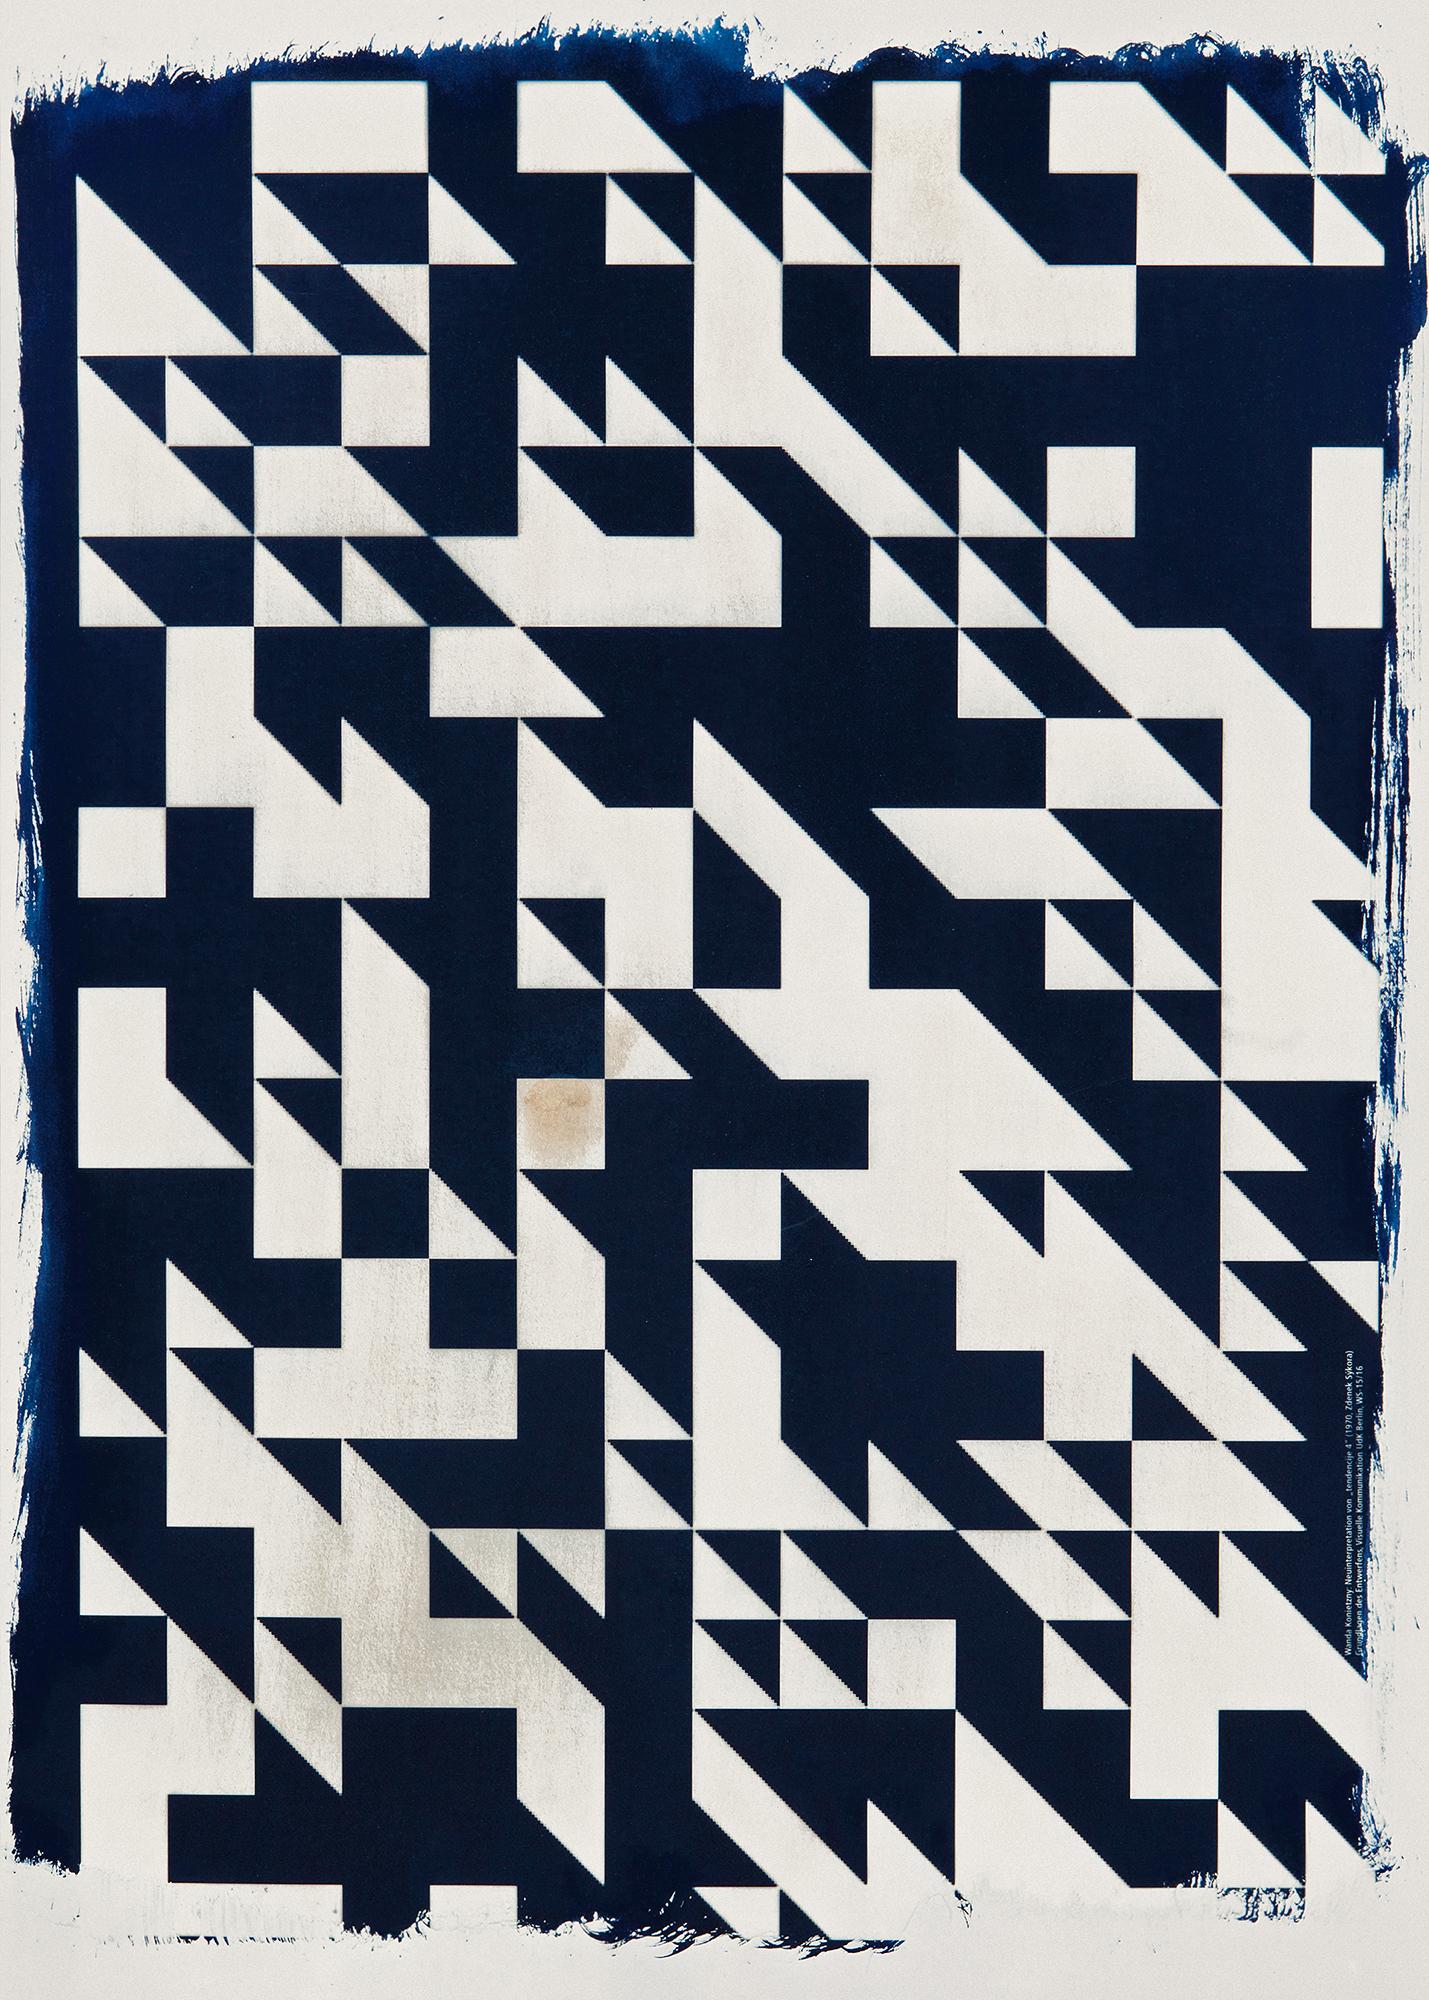 Wanda Konietzny, 42×59,4 cm, Inspiriation: Zdenek Sykora, Black-White-Structure, 1965